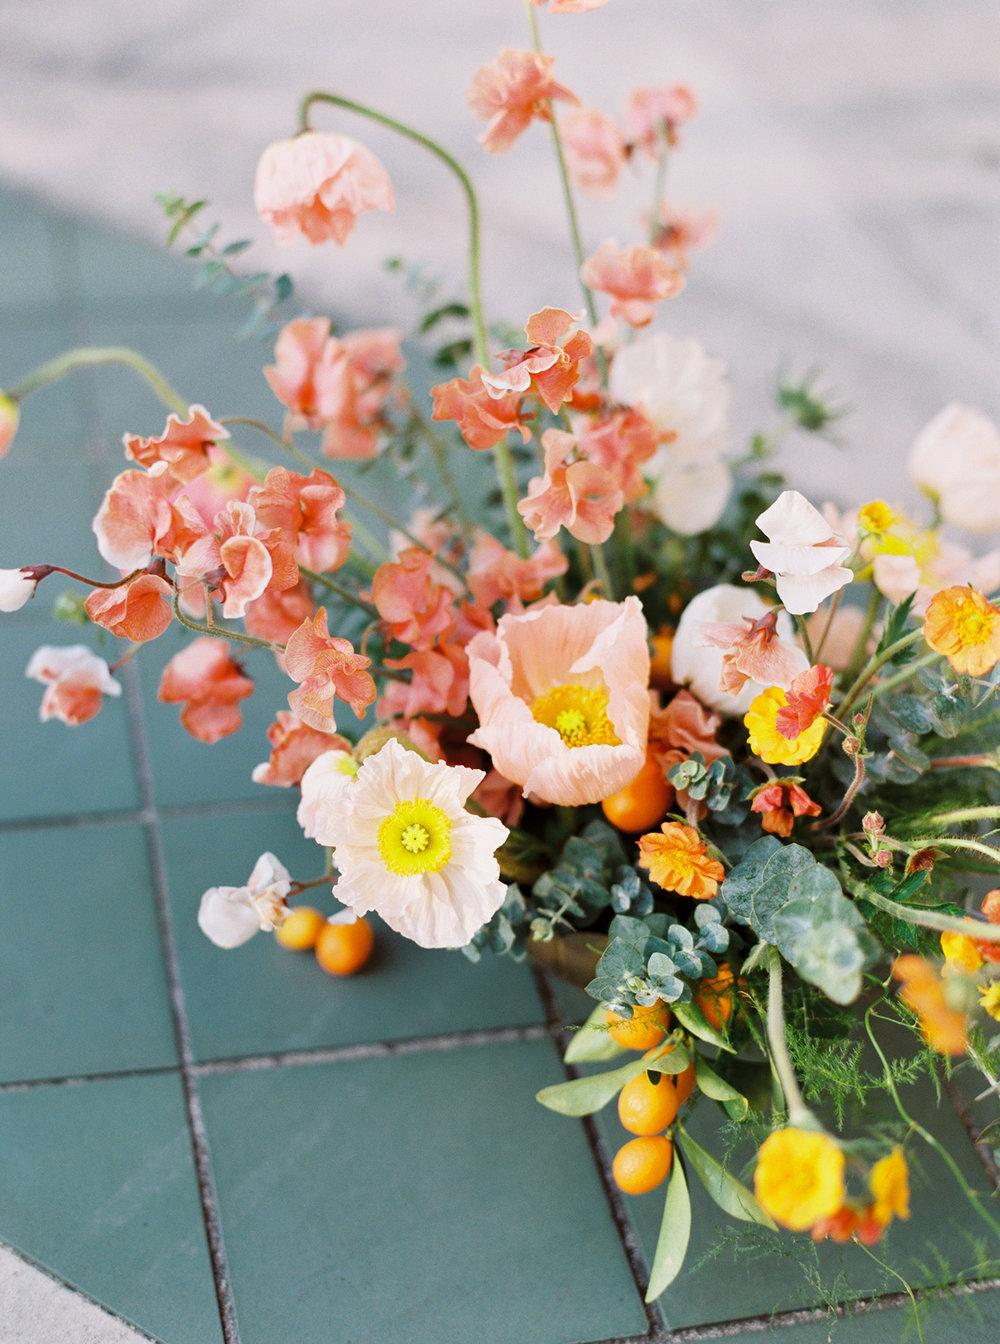 Fine Art Wedding Florist - Dallas, Texas - Olive Grove Design - 00044.jpg